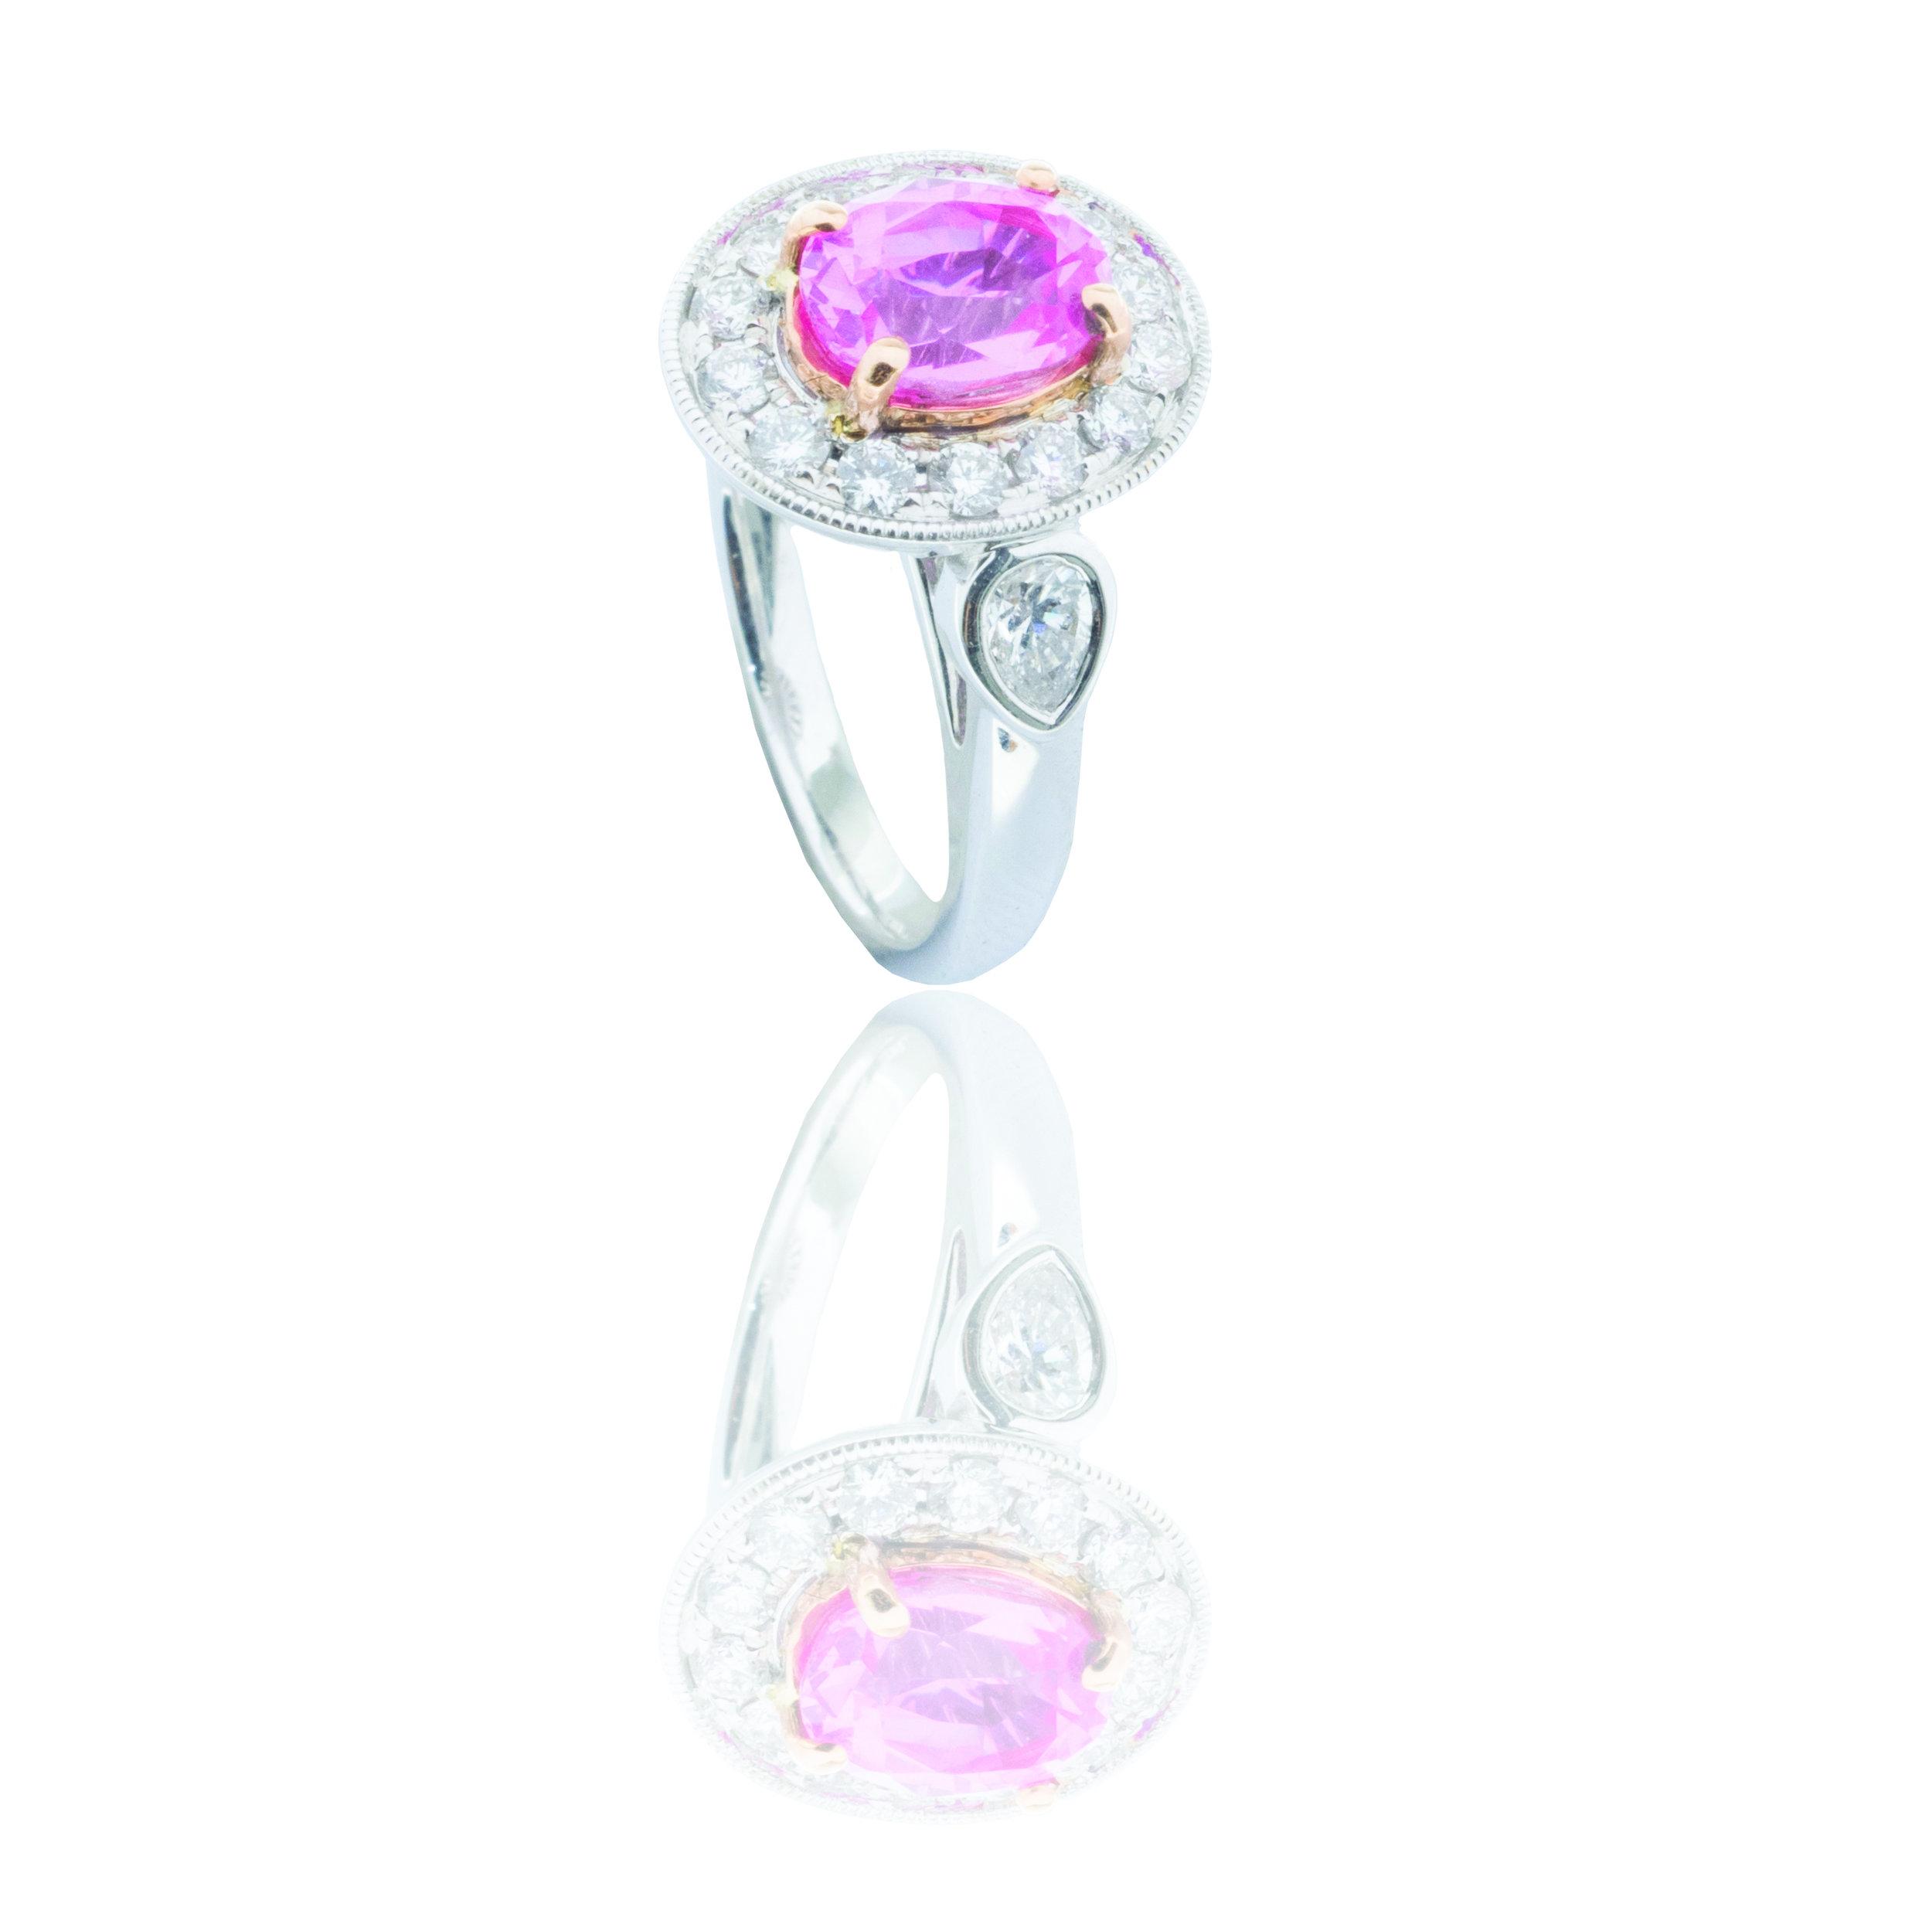 Pink sapphire diamond ring! - SOLD